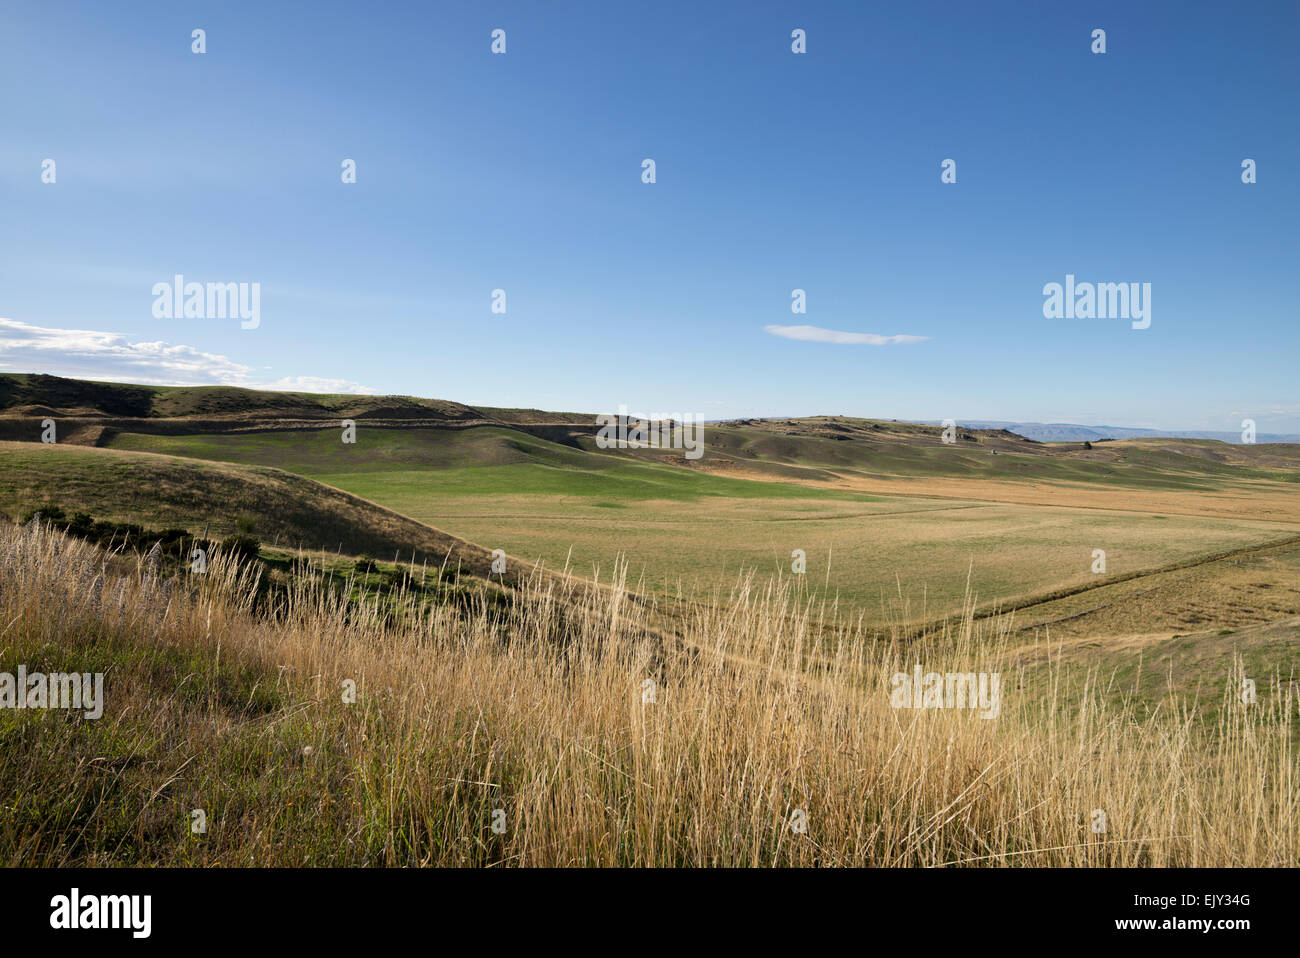 Maniototo Plains, Otago region, south island, New Zealand. - Stock Image